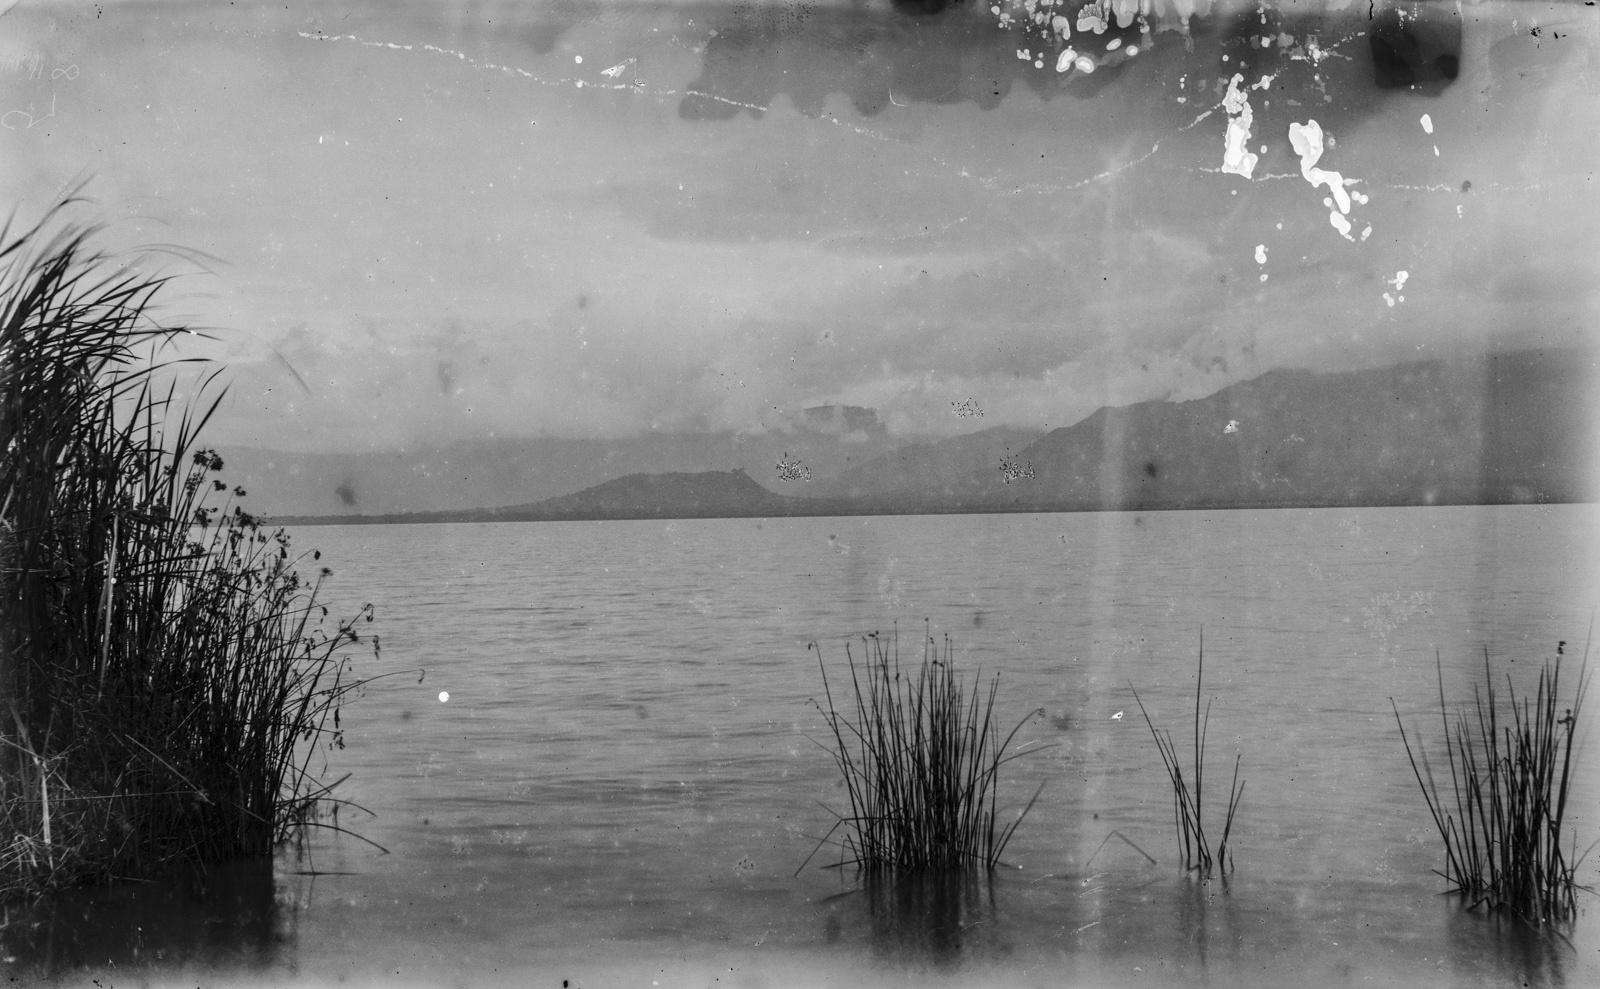 65. Окрестности гор Паре  с видом на озеро